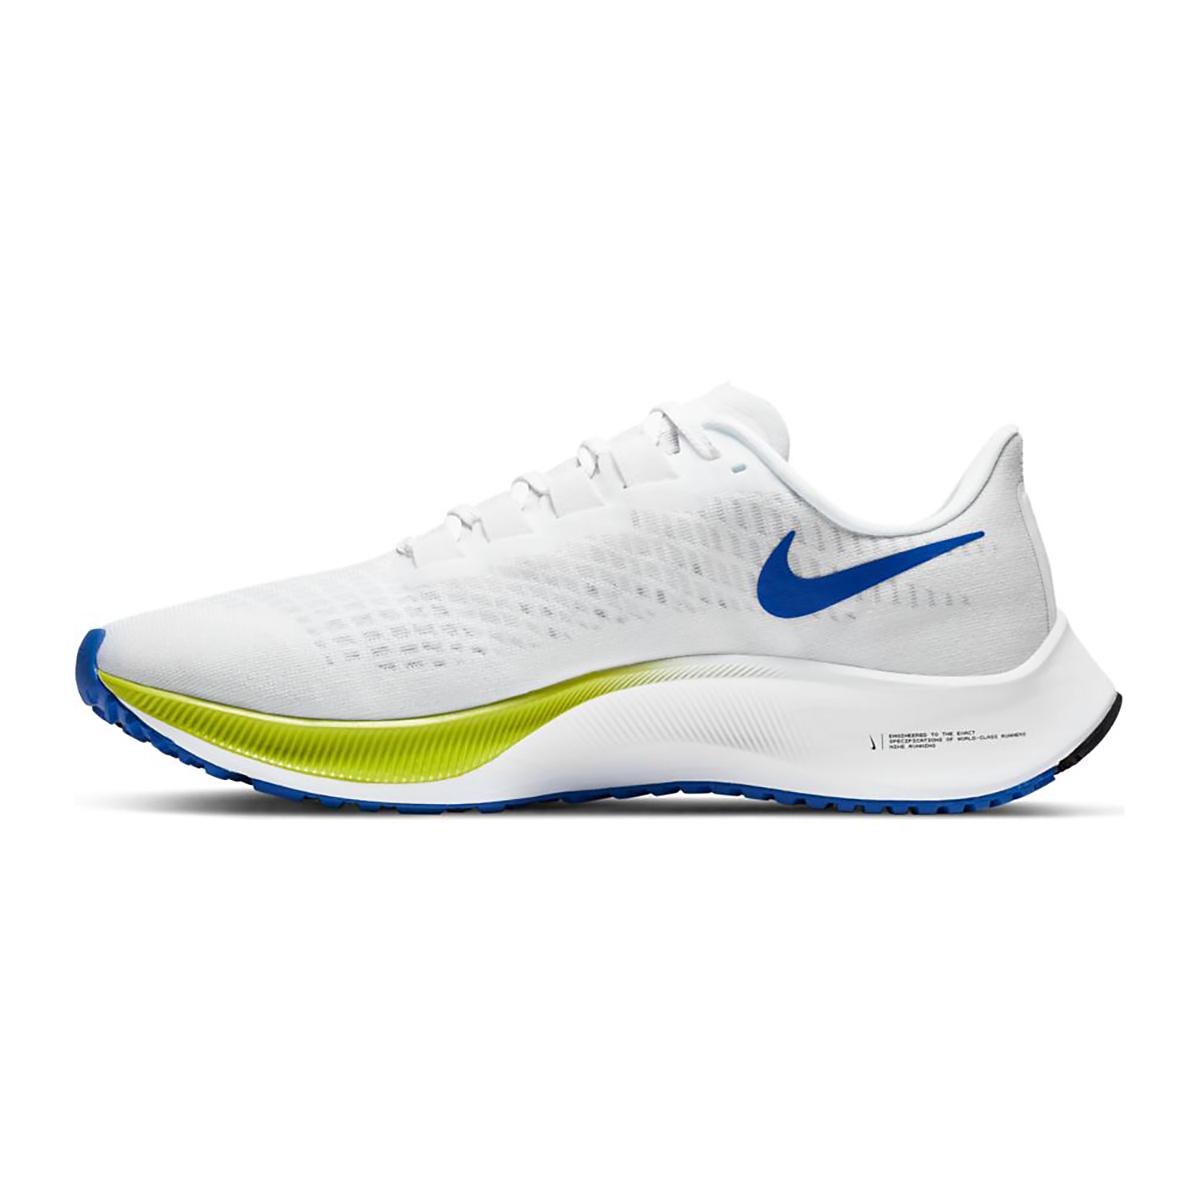 Men's Nike Air Zoom Pegasus 37 Running Shoe - Color: White/Racer Blue/Cyber/Black - Size: 6 - Width: Regular, White/Racer Blue/Cyber/Black, large, image 2